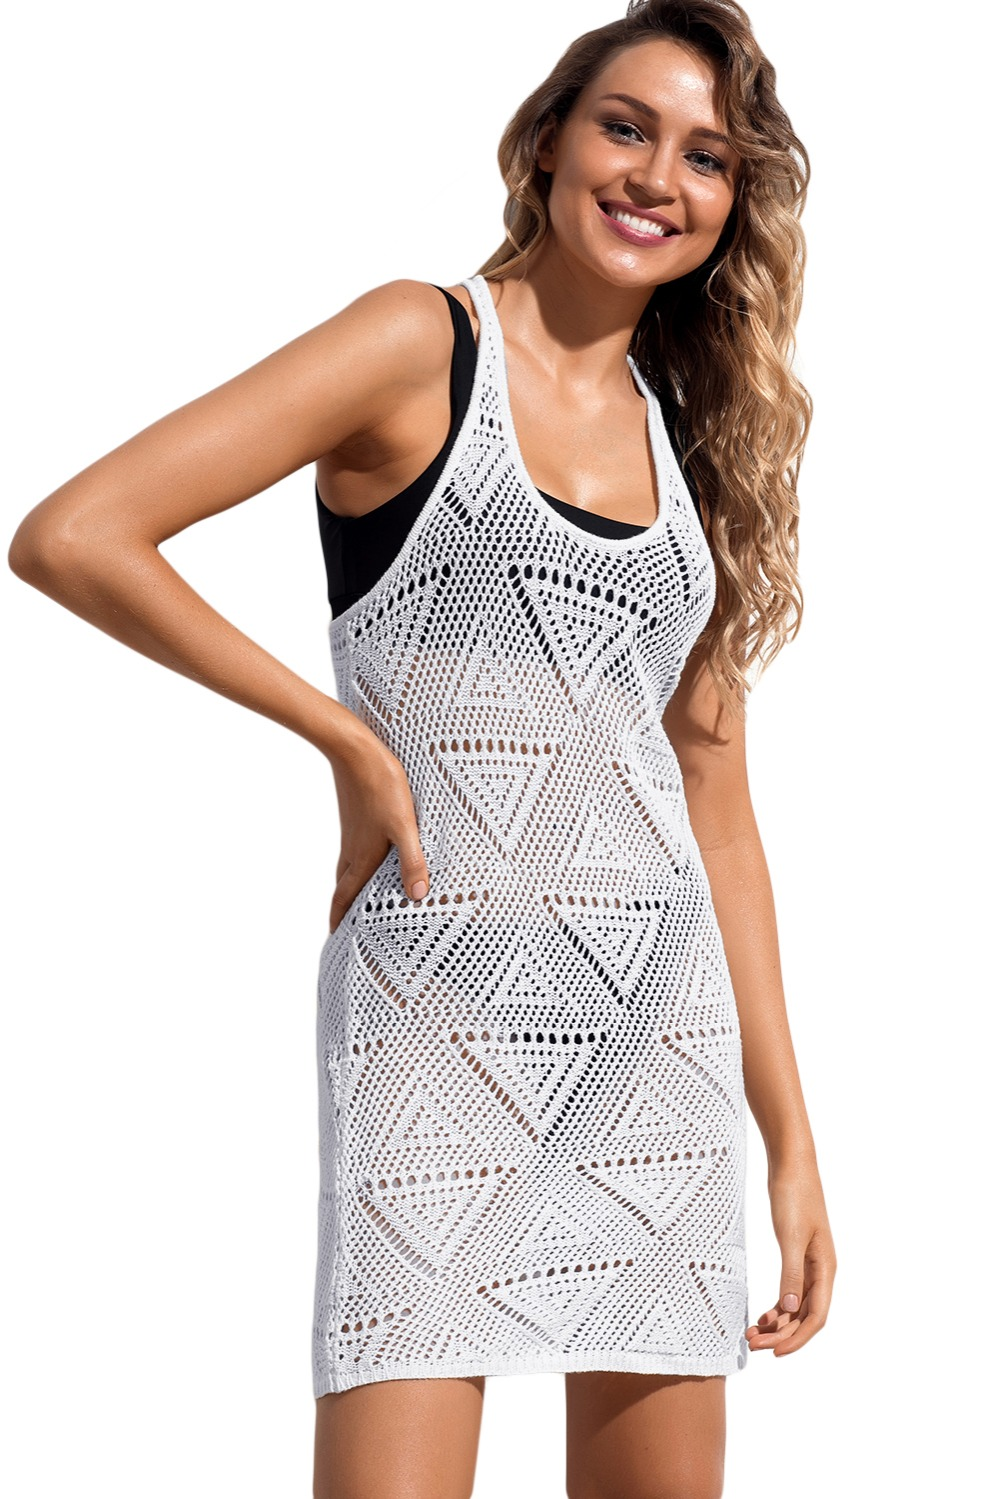 Hollow White Geometric Crochet Beach Swim Cover up Wrap Bathing Suit Beachwear Cover Up Black Cutout cover ups tank dress